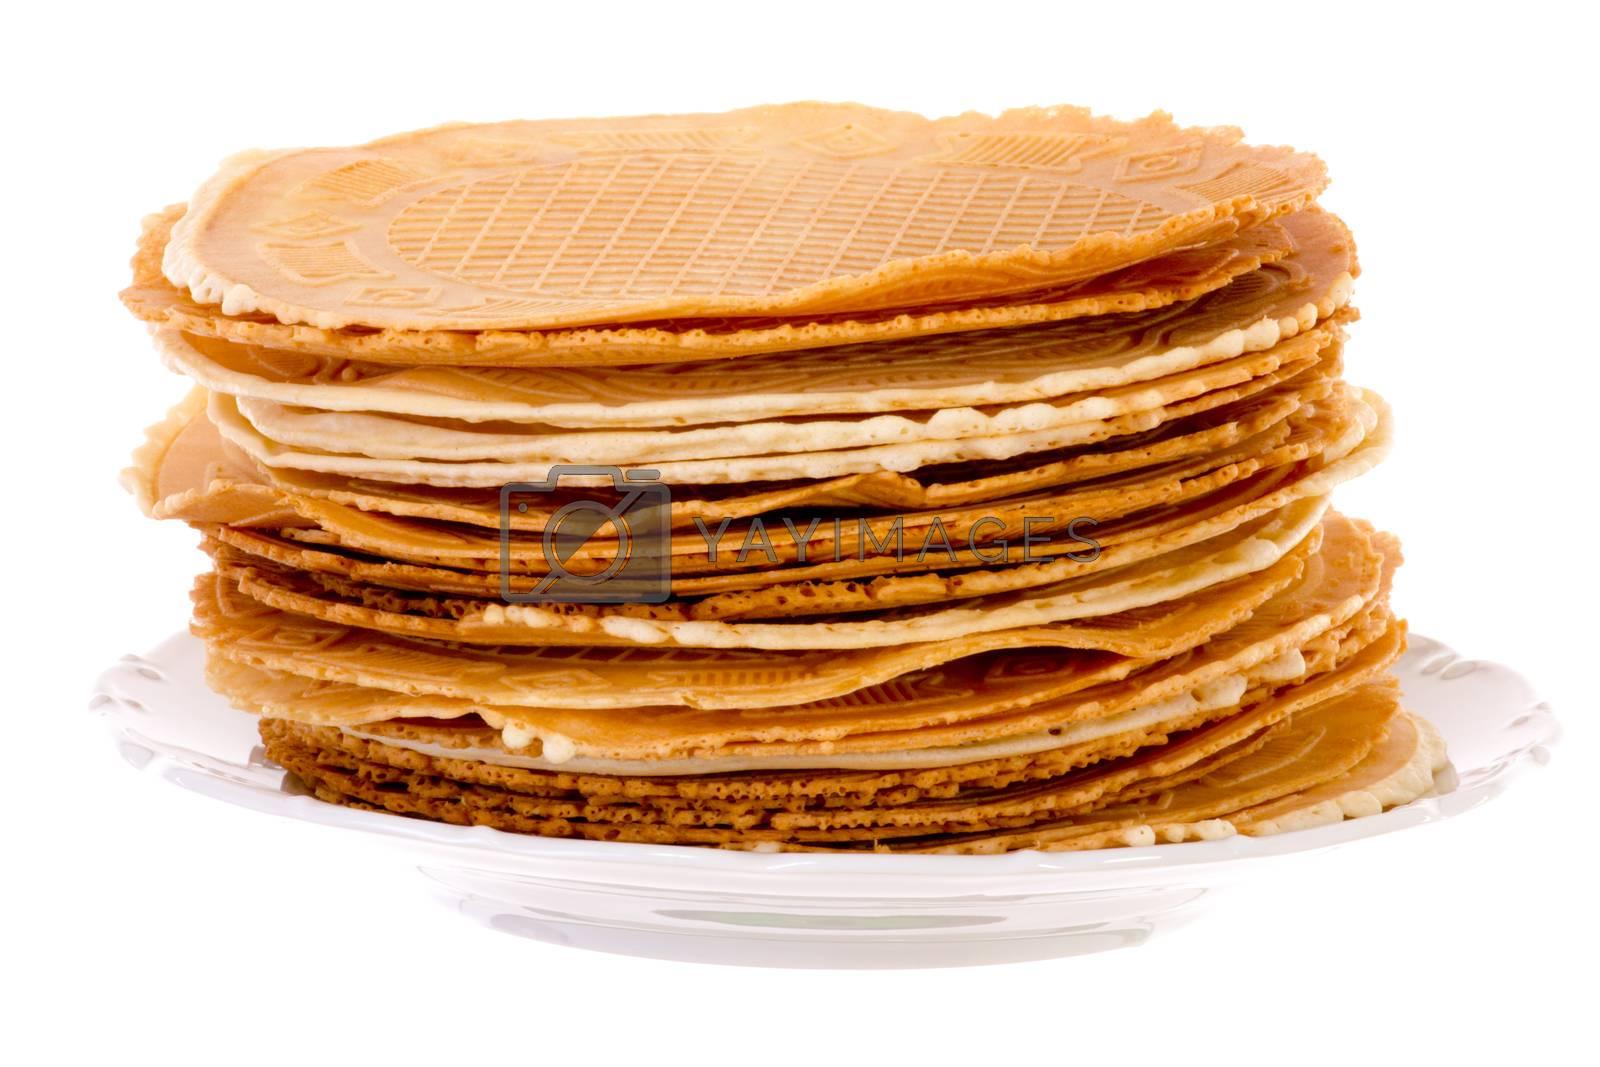 Pack of fresh baked krumkakes brightened